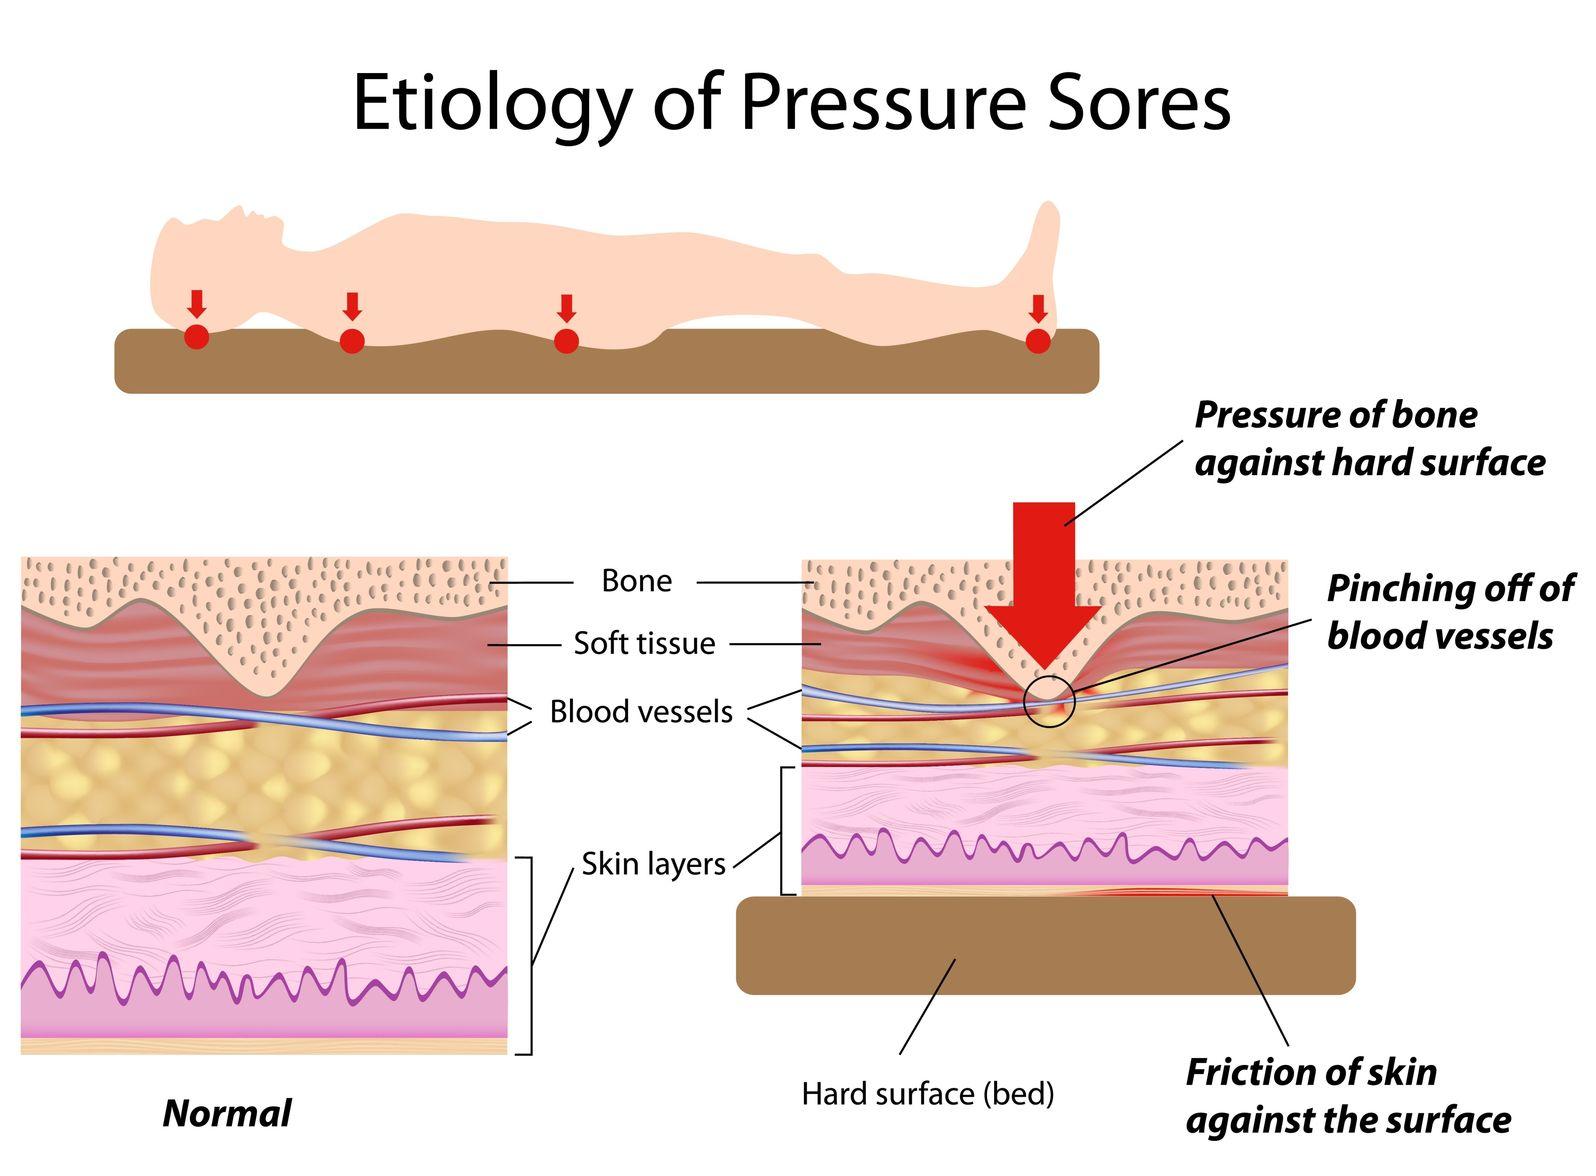 EtiologyPressureSores